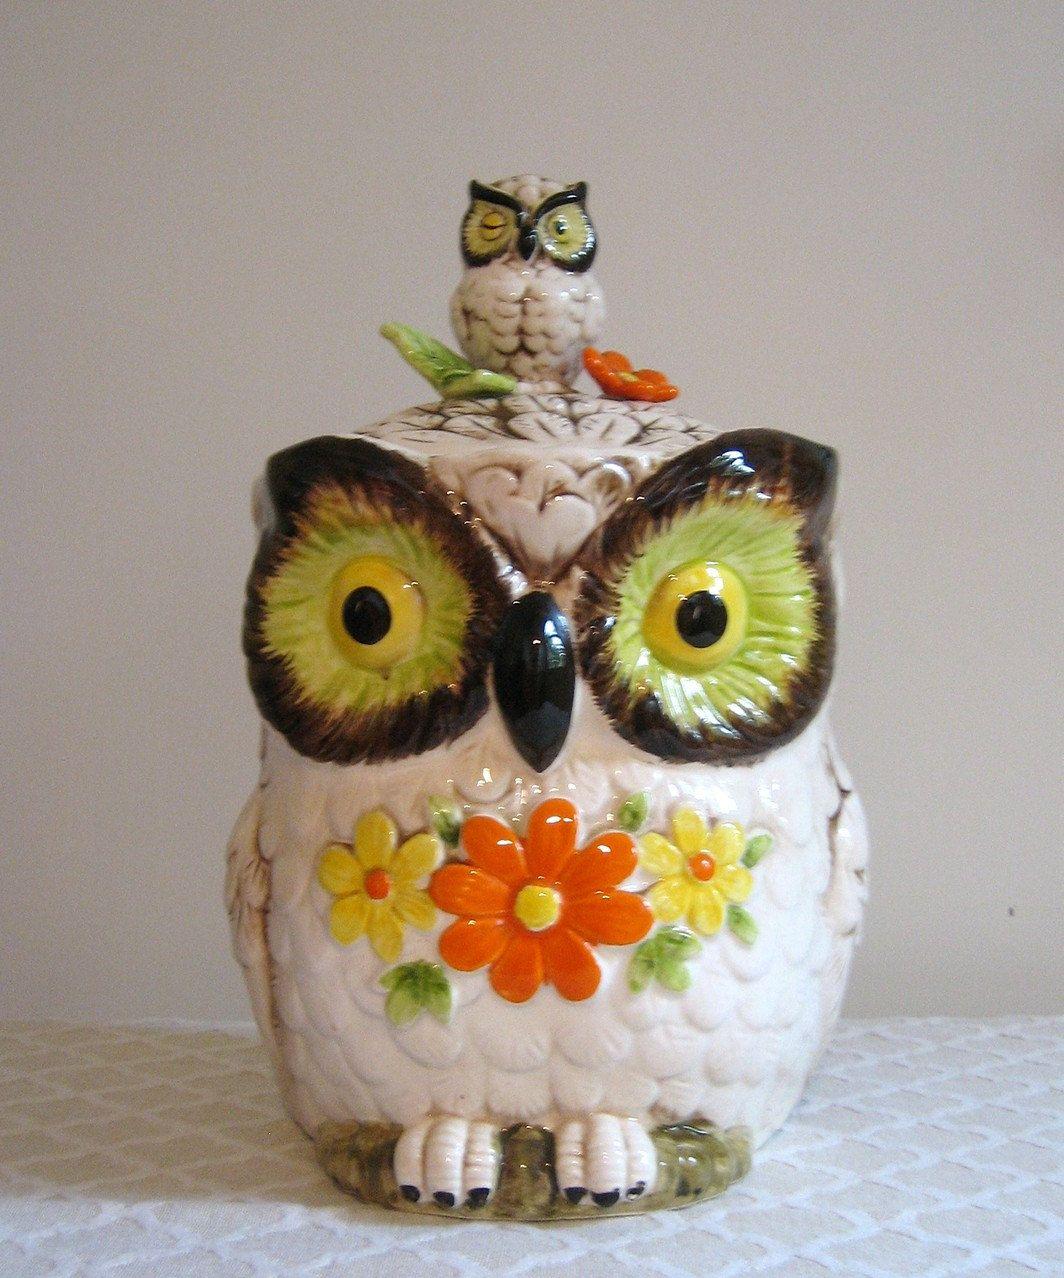 Retro Owl Cookie Jar